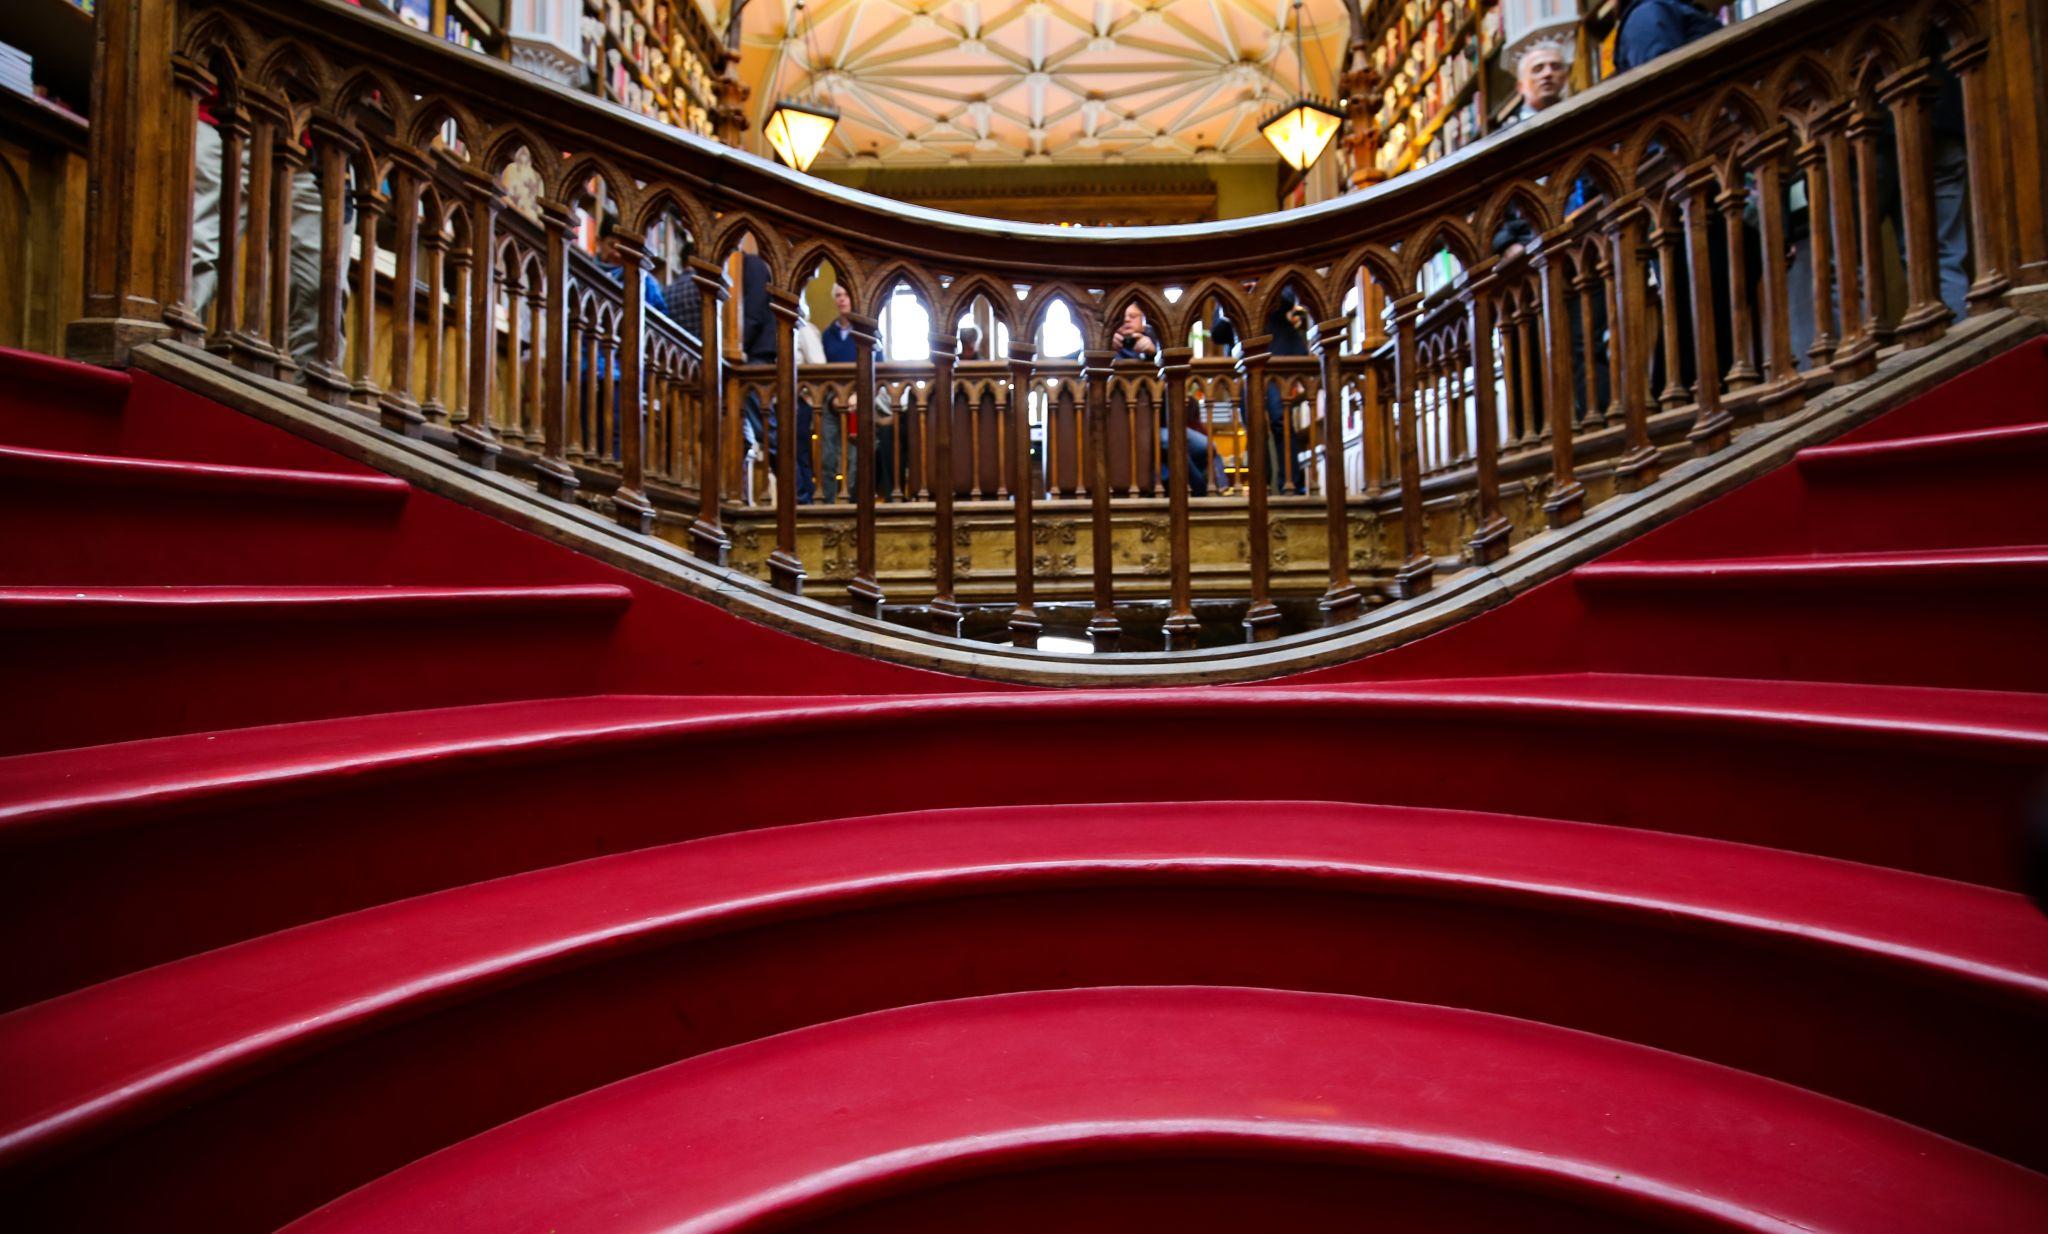 Livraria Lello, Staircase, Portugal